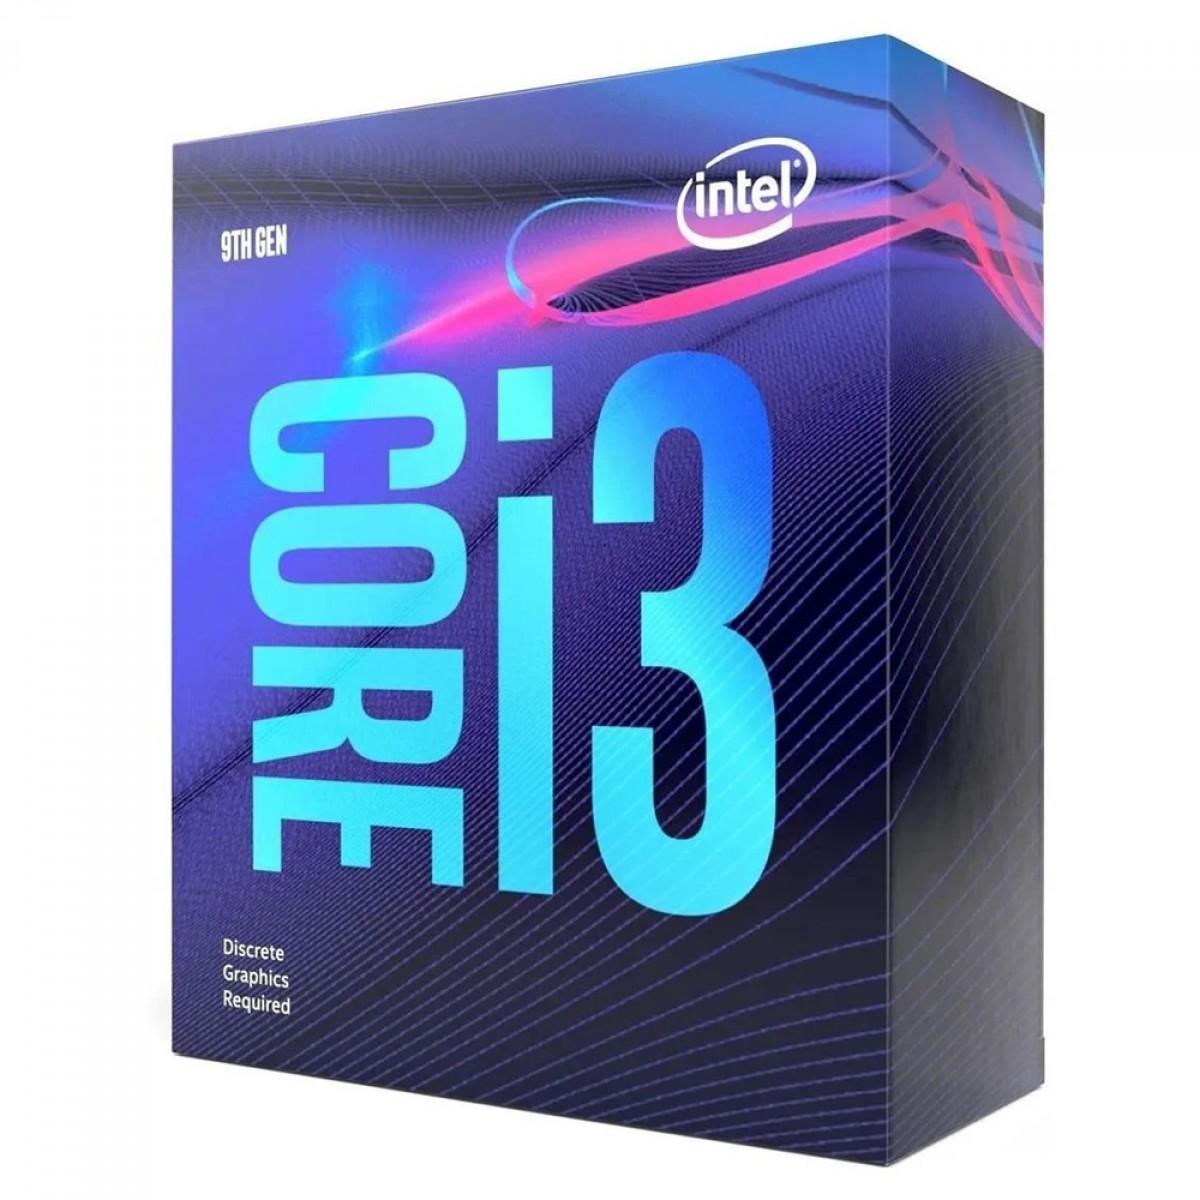 Kit Upgrade, GIGABYTE B360M AORUS Gaming 3 + Intel Core I3 9100F + 8GB DDR4 3000MHz